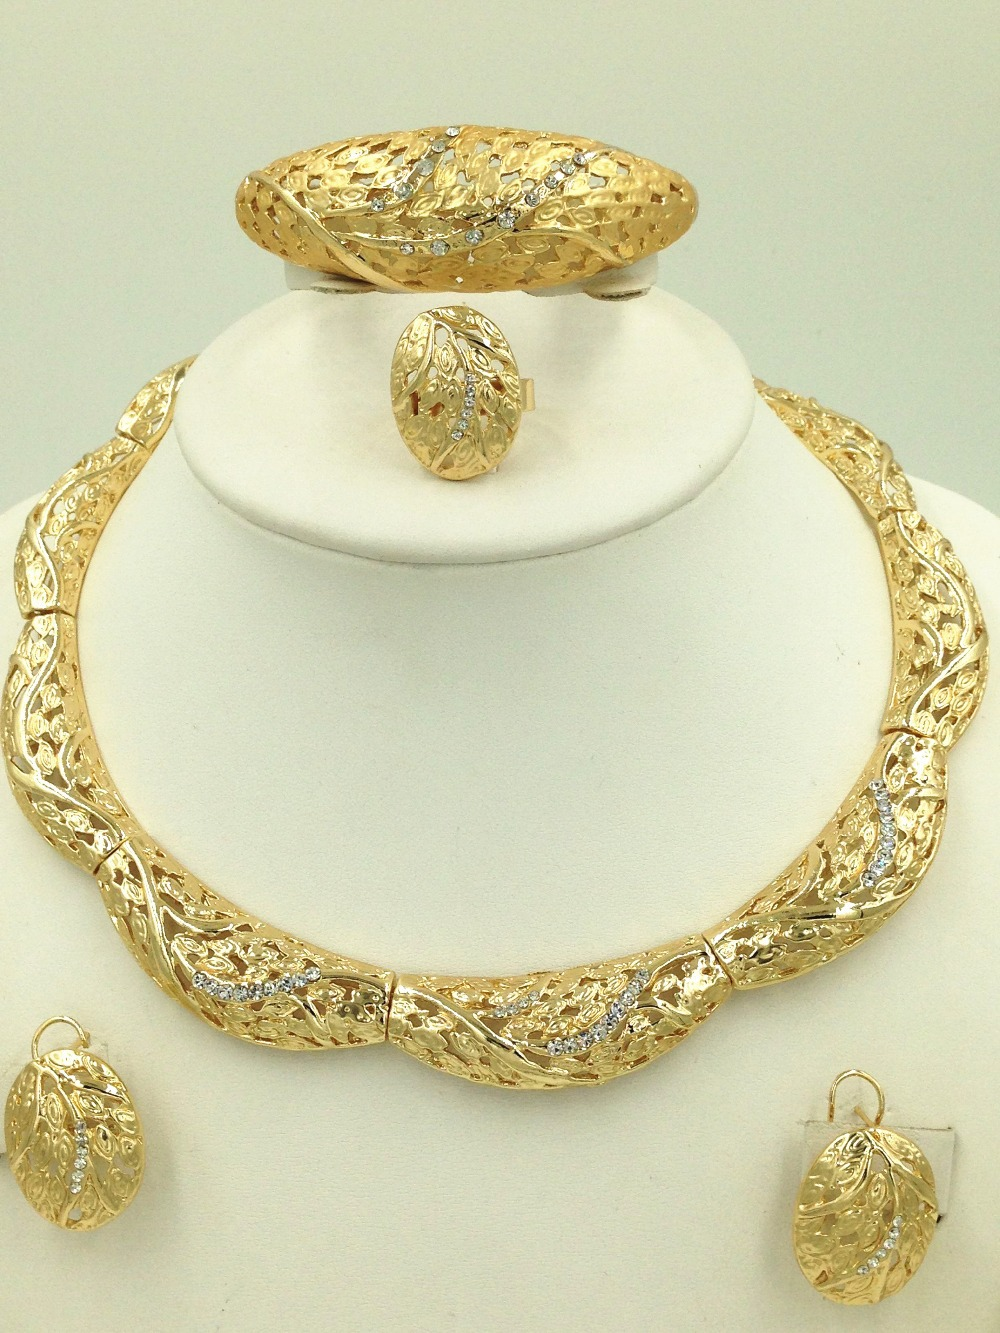 2015 Dubai Design Fashion Necklace Set Dubai 18K Gold Plated ...